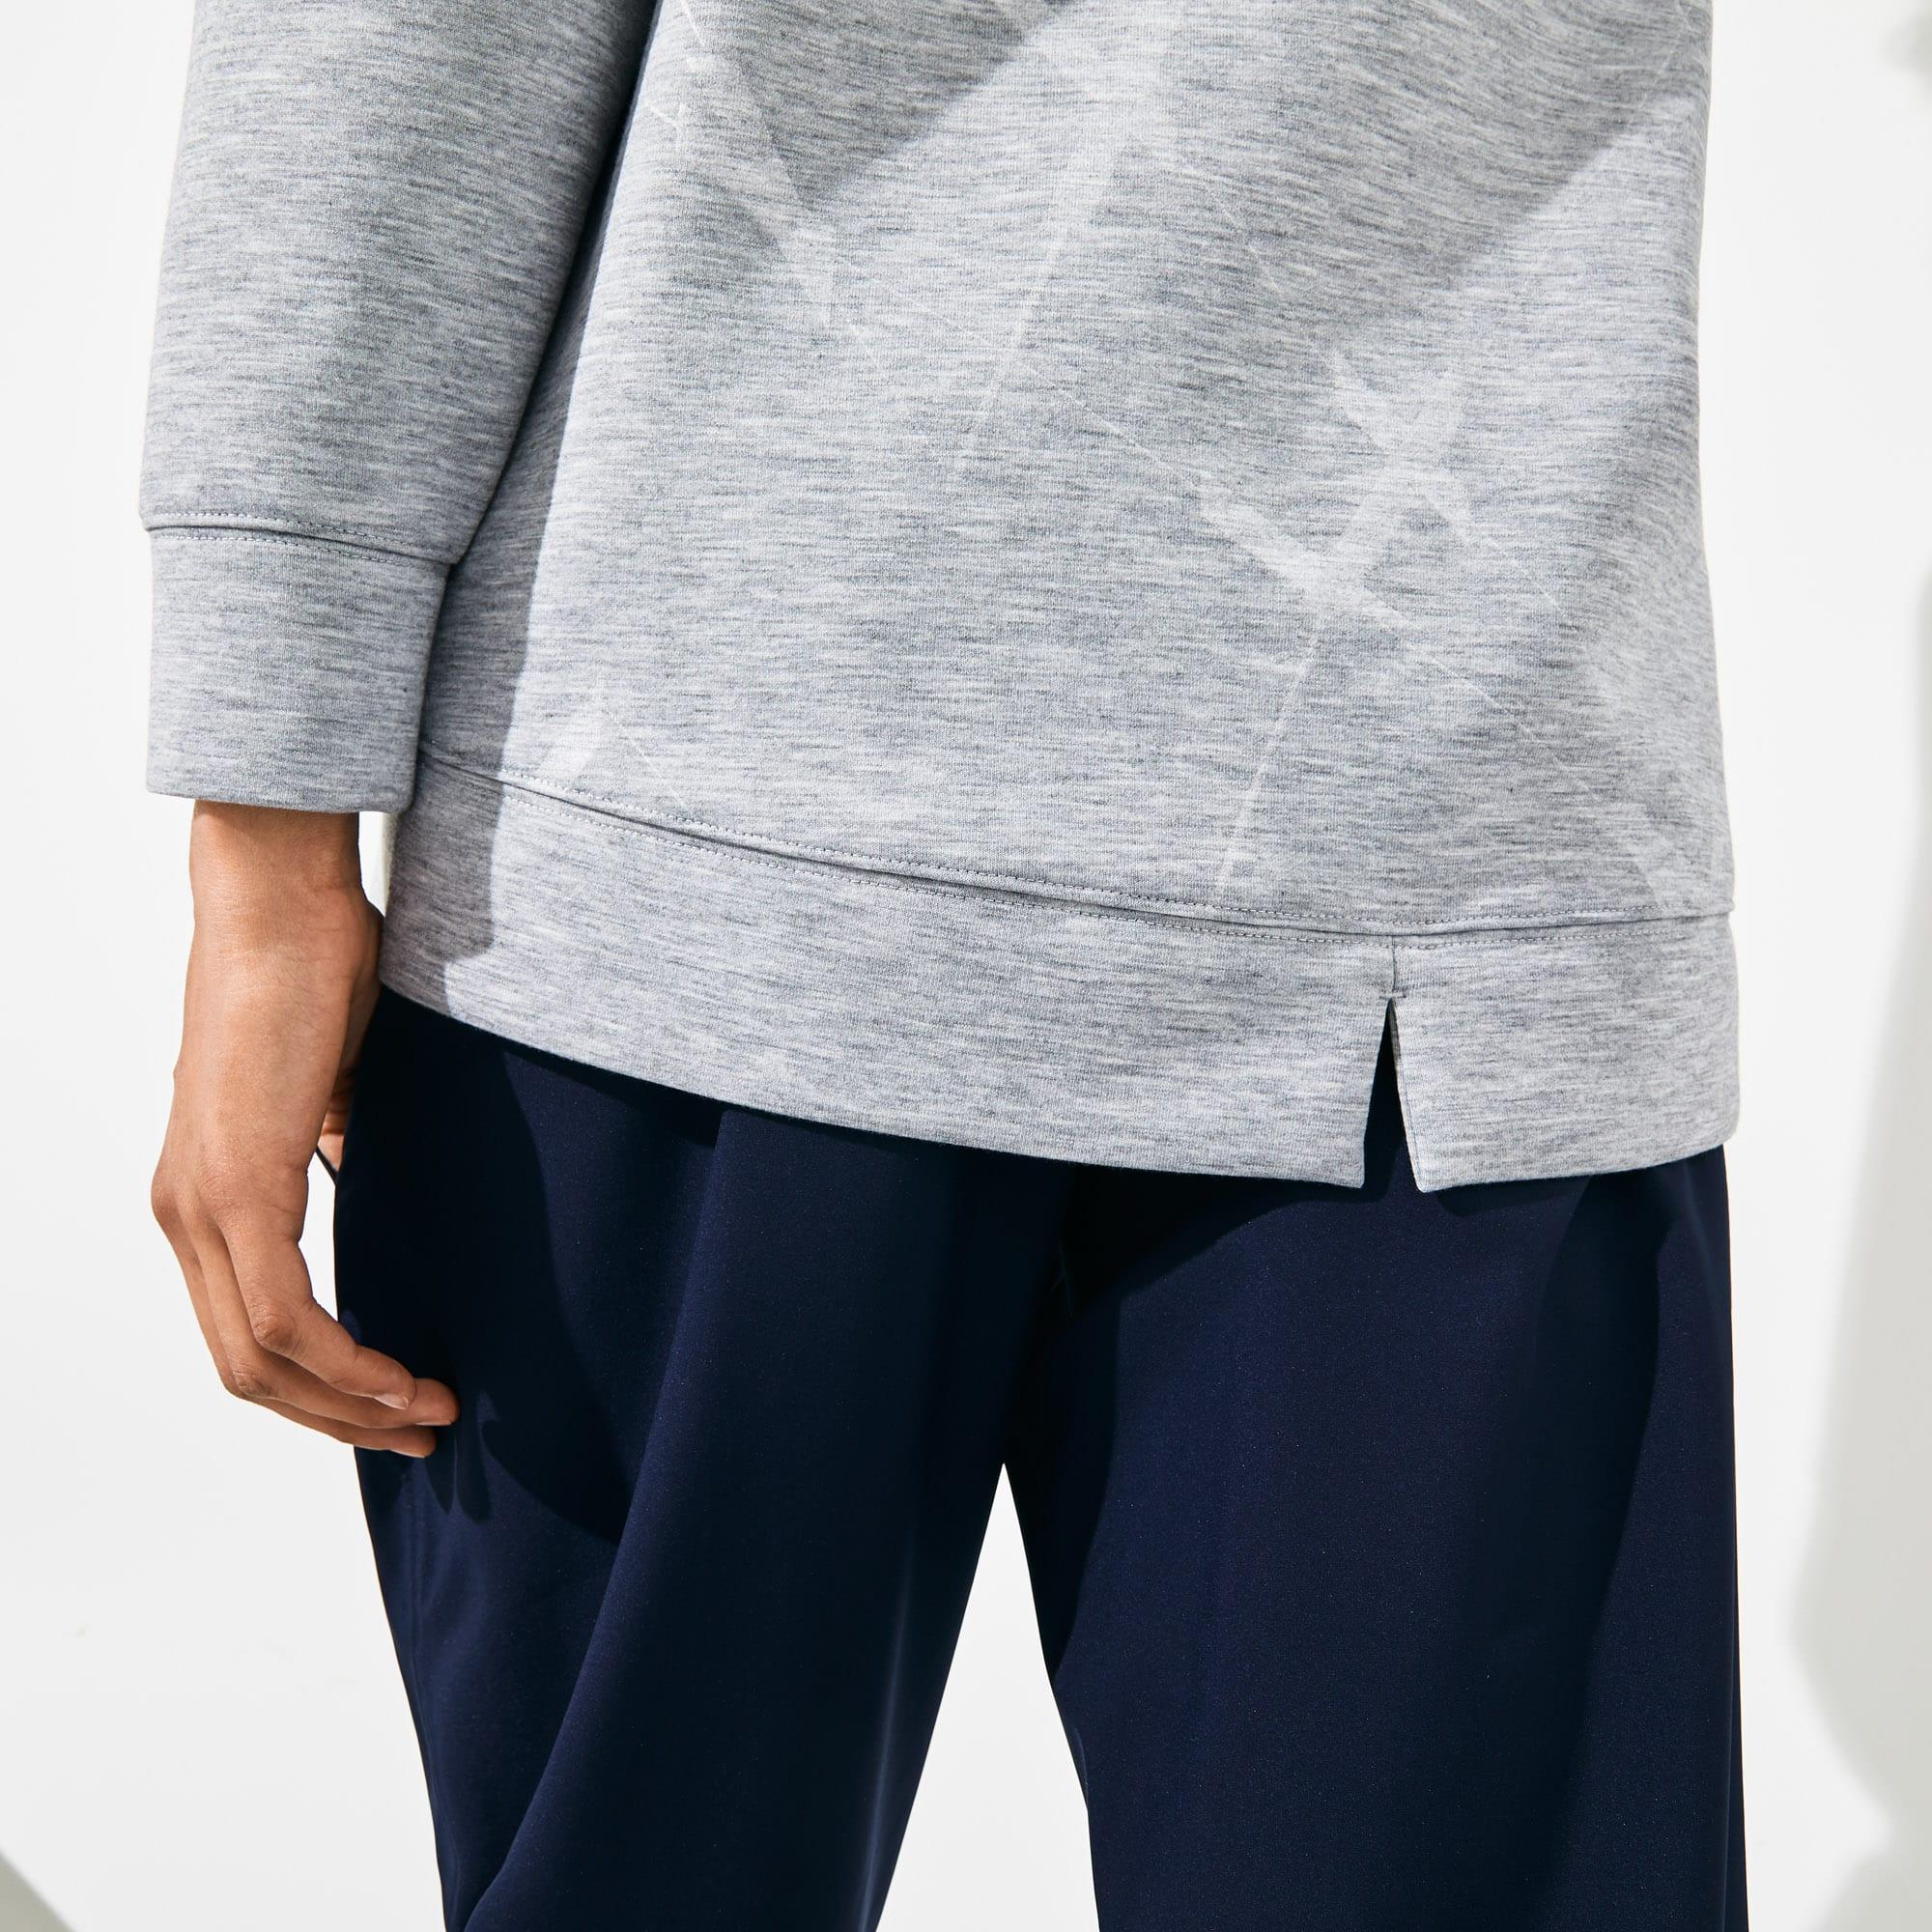 new style 52ca2 714d2 Damen LACOSTE SPORT Tennis-Sweatshirt mit Kapuze